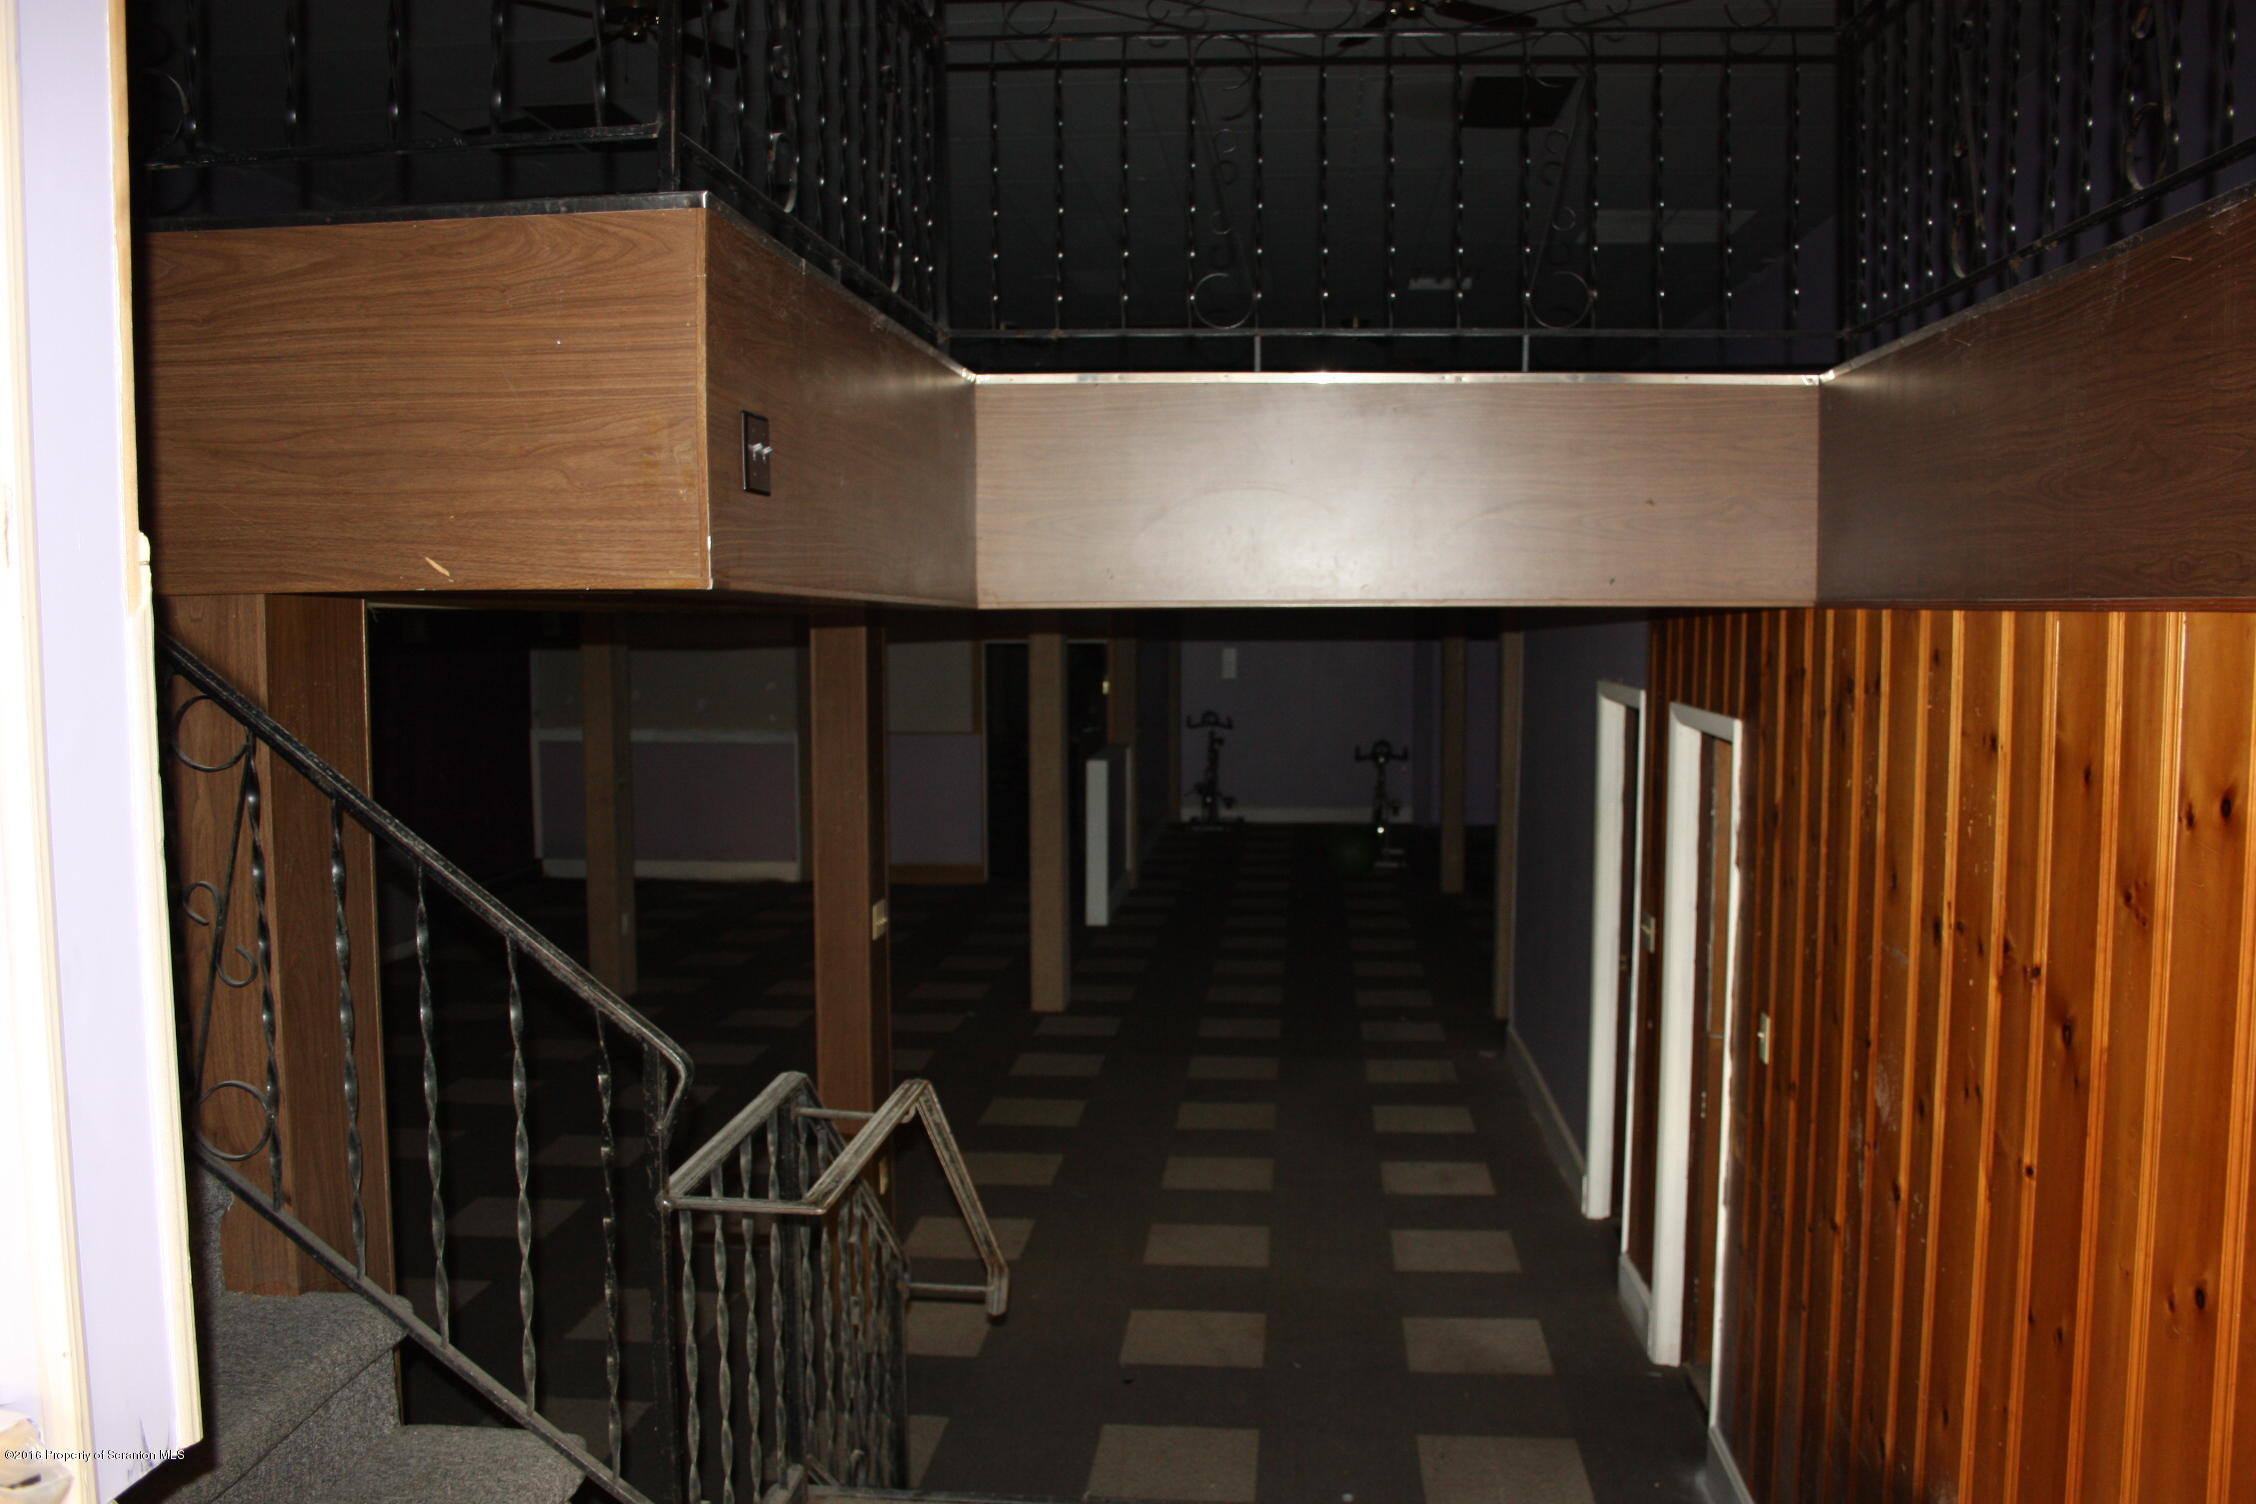 639 Sanderson St, Throop, Pennsylvania 18512, ,1 BathroomBathrooms,Commercial,For Sale,Sanderson,16-5889